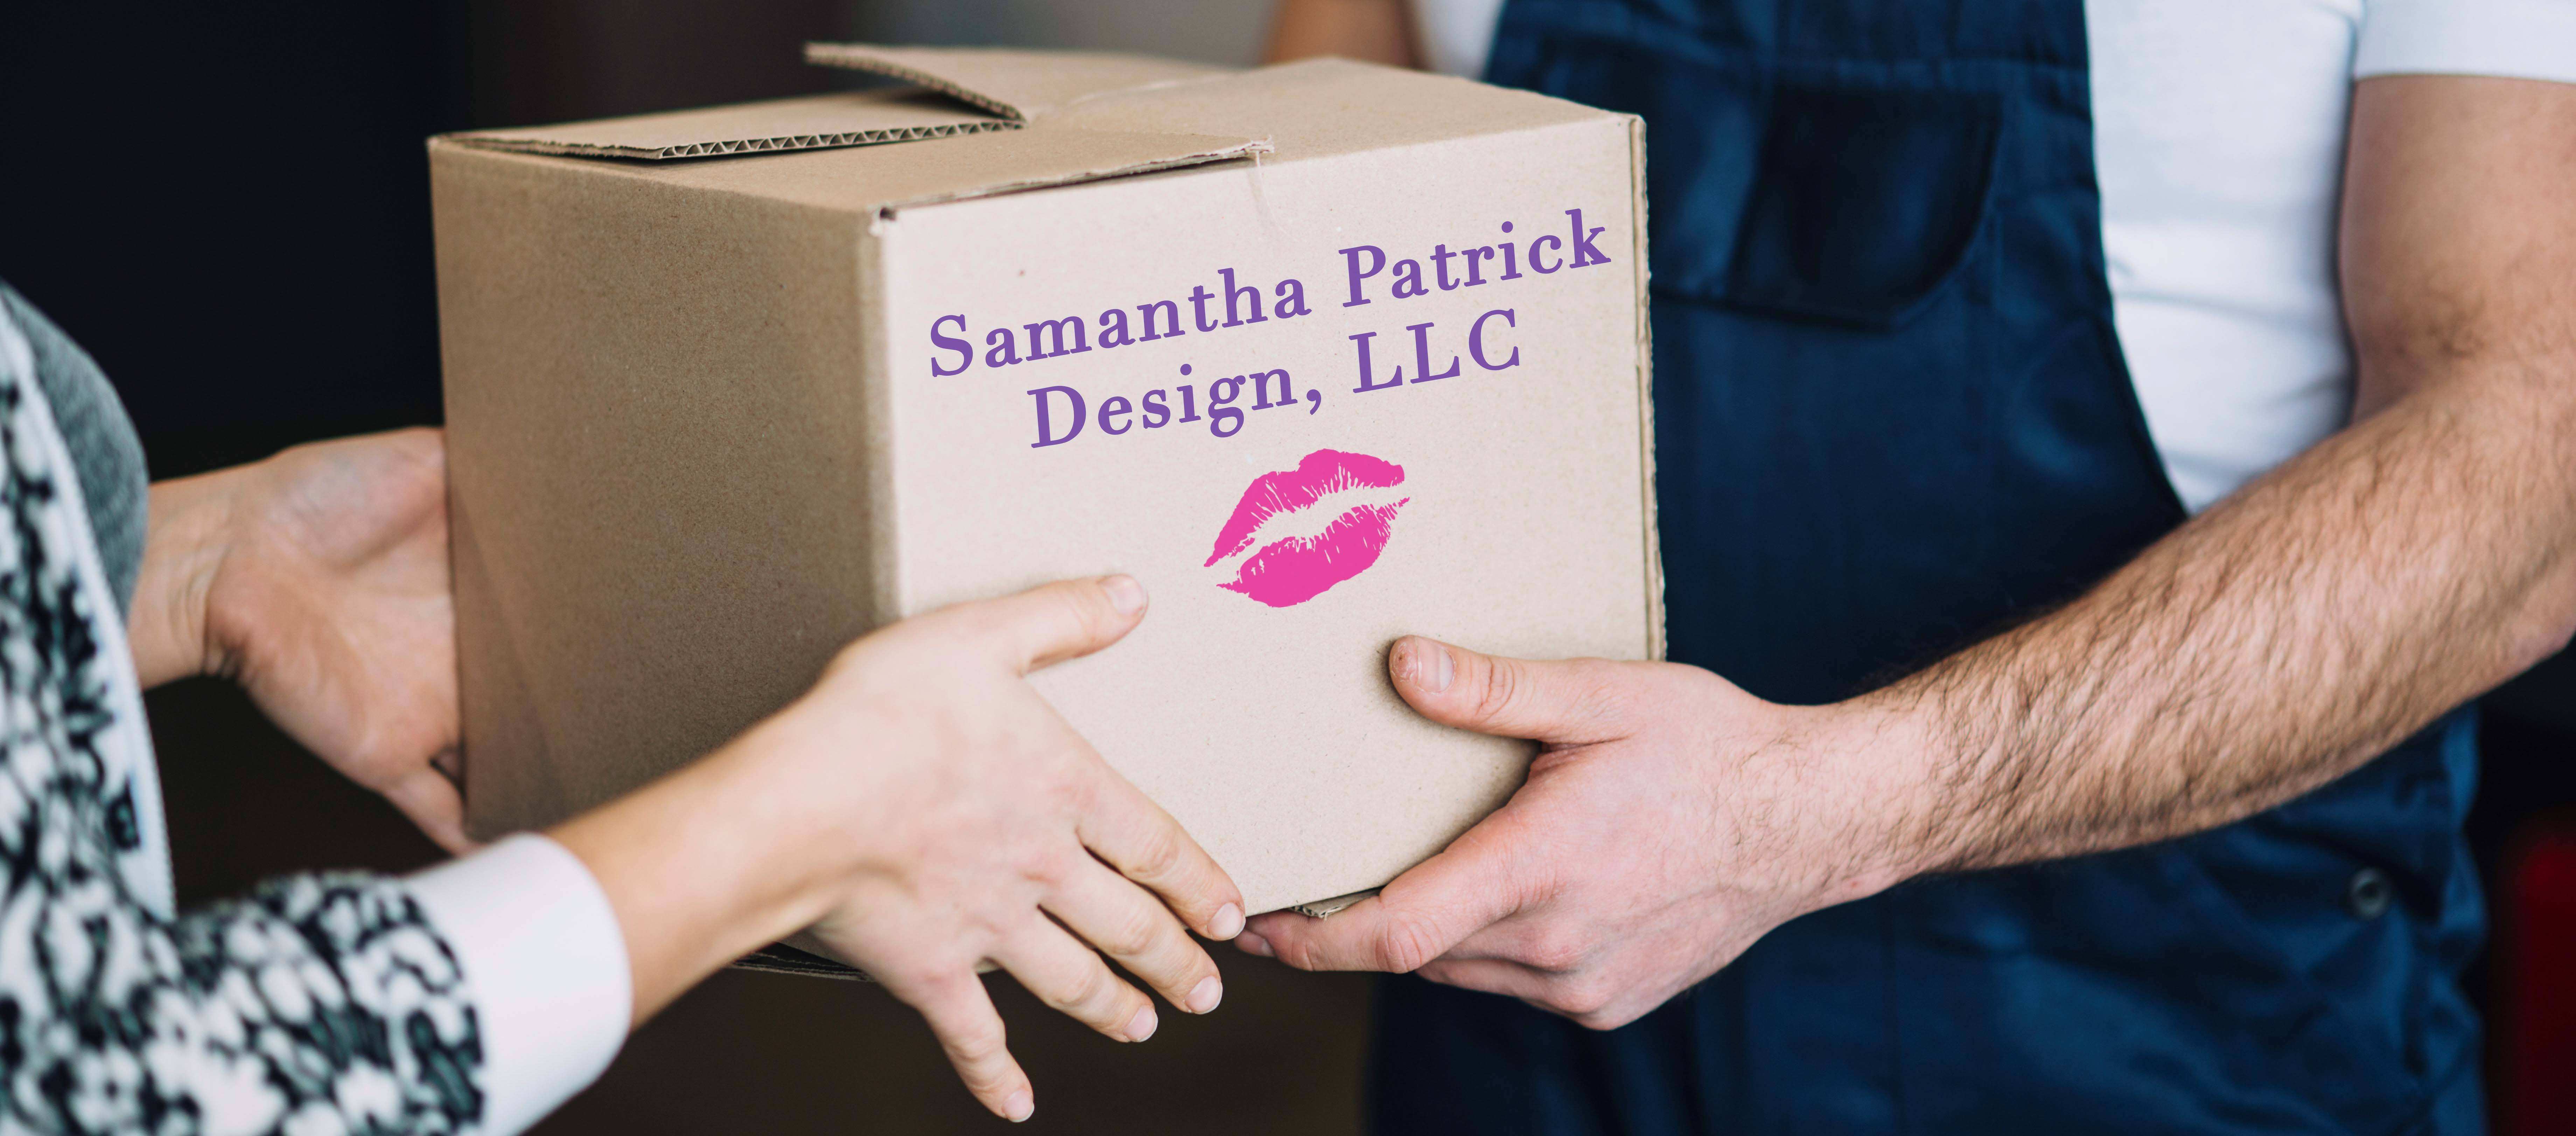 shipping-samantha-mystrippercloset.jpg